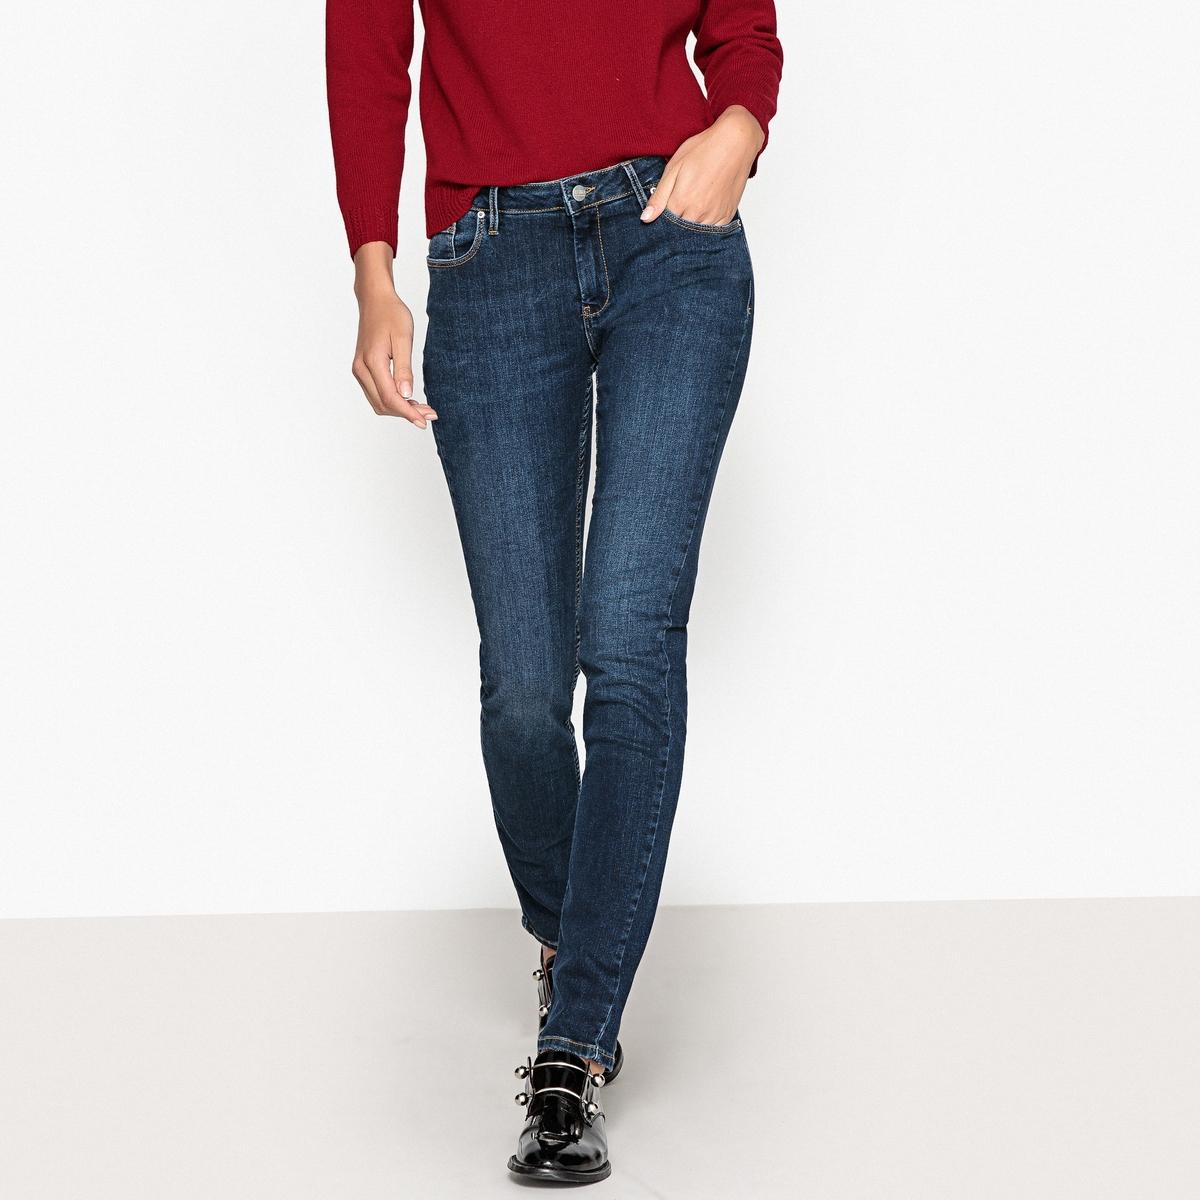 Джинсы узкие TEBO insight джинсы узкие женские insight python overdye deadbeet